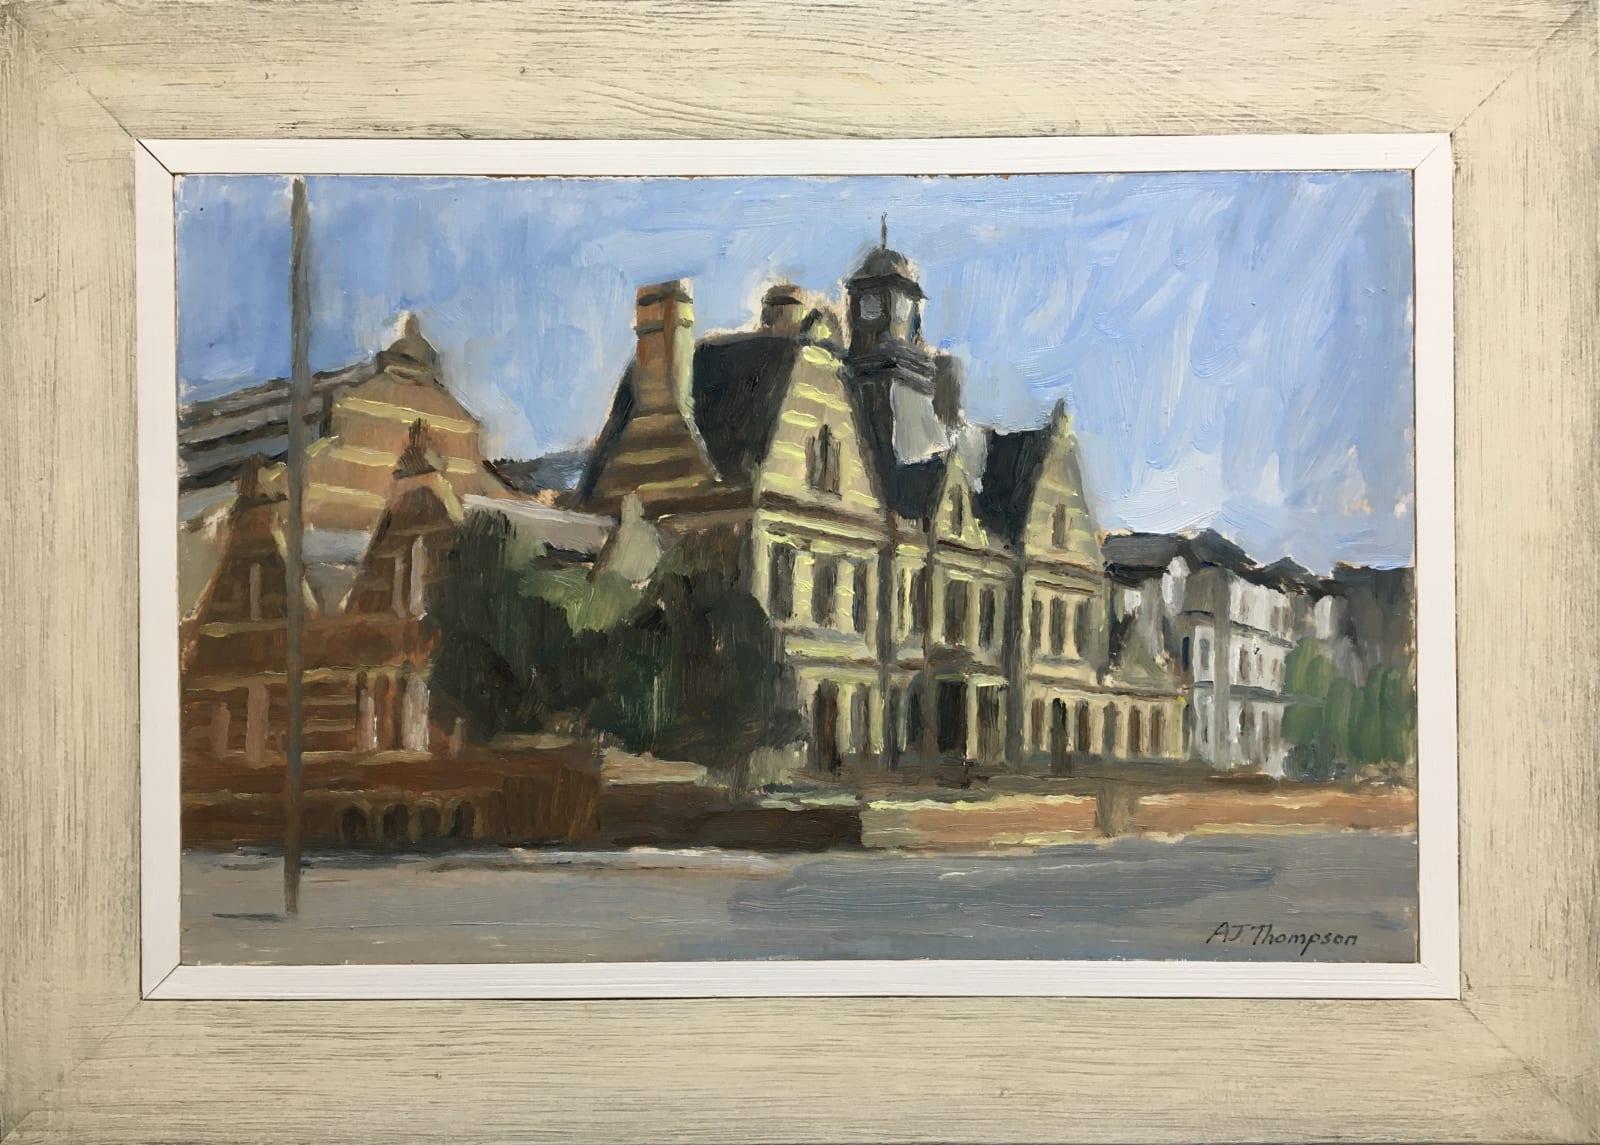 Alan James Thompson, Victoria Baths, Manchester